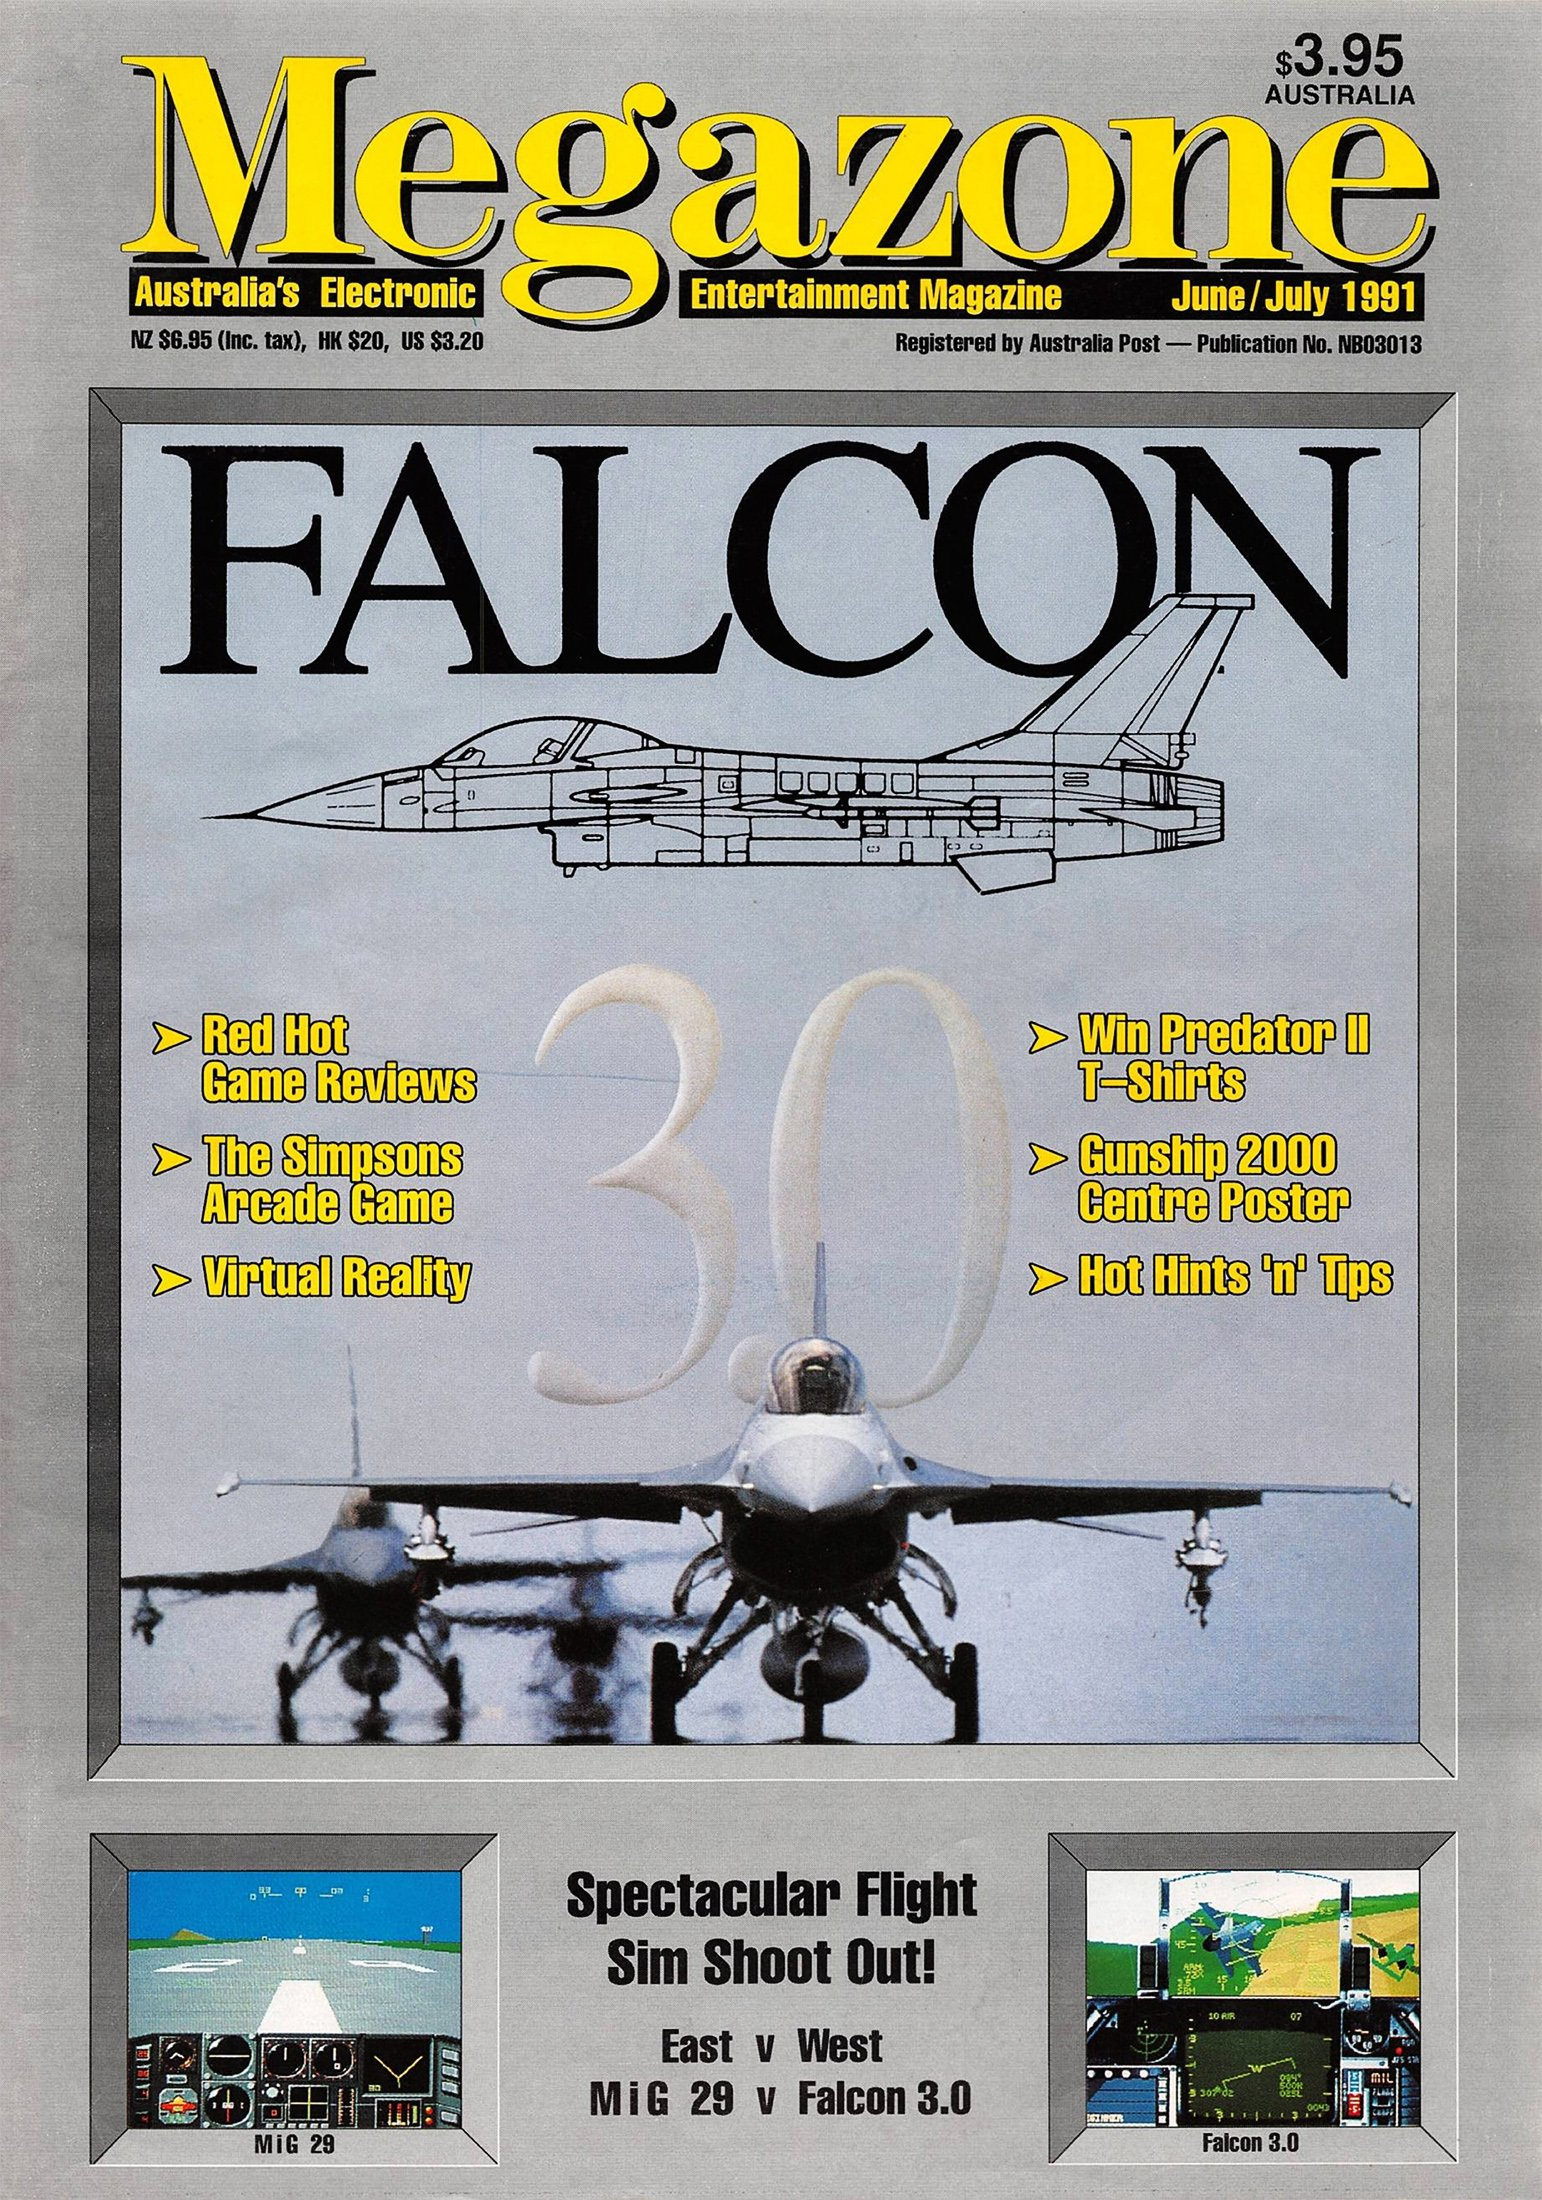 MegaZone 16 (June / July 1991)